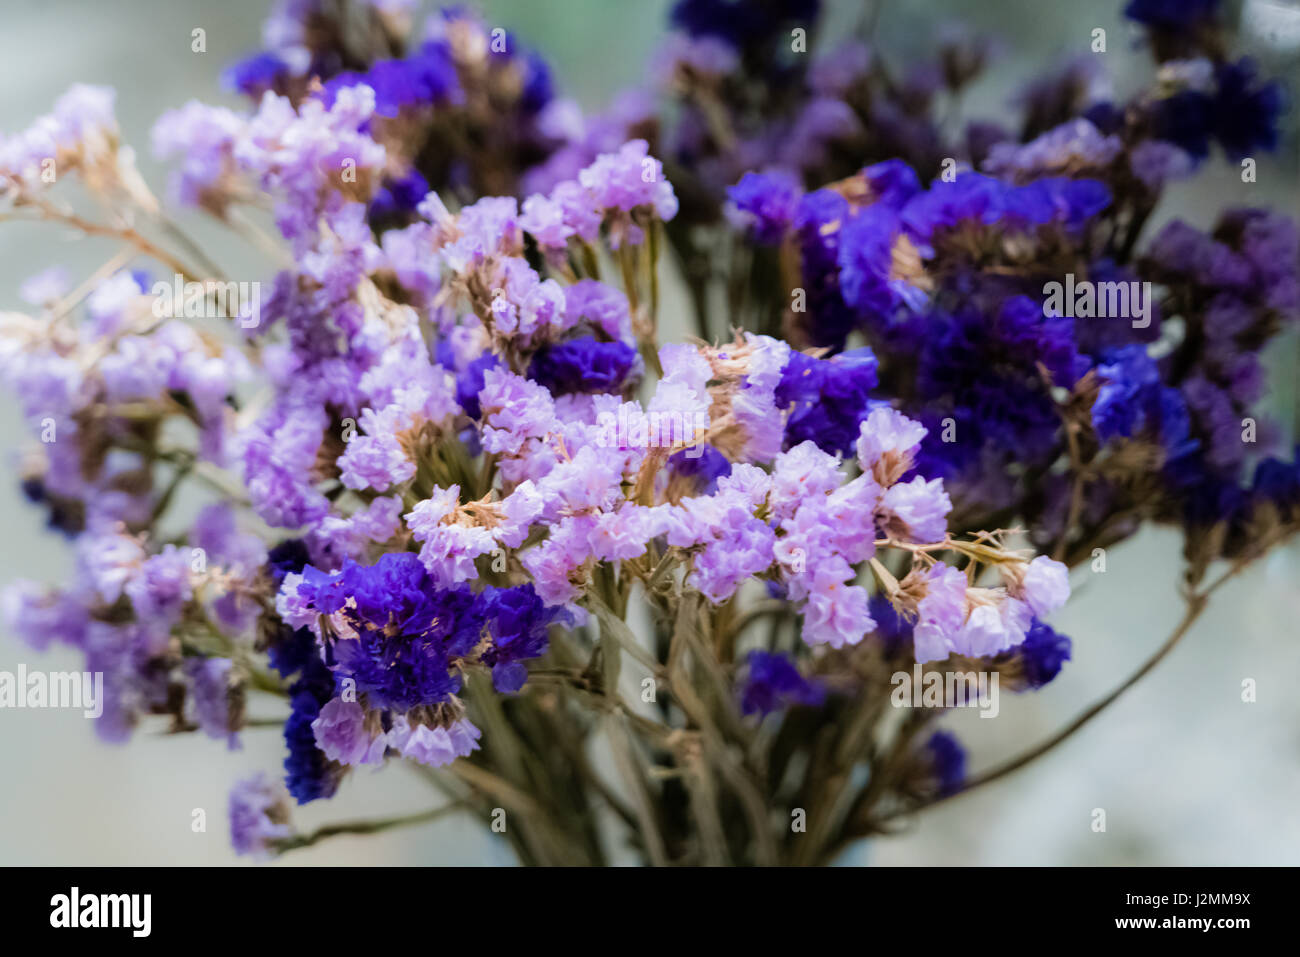 Purple statice flowers - Stock Image